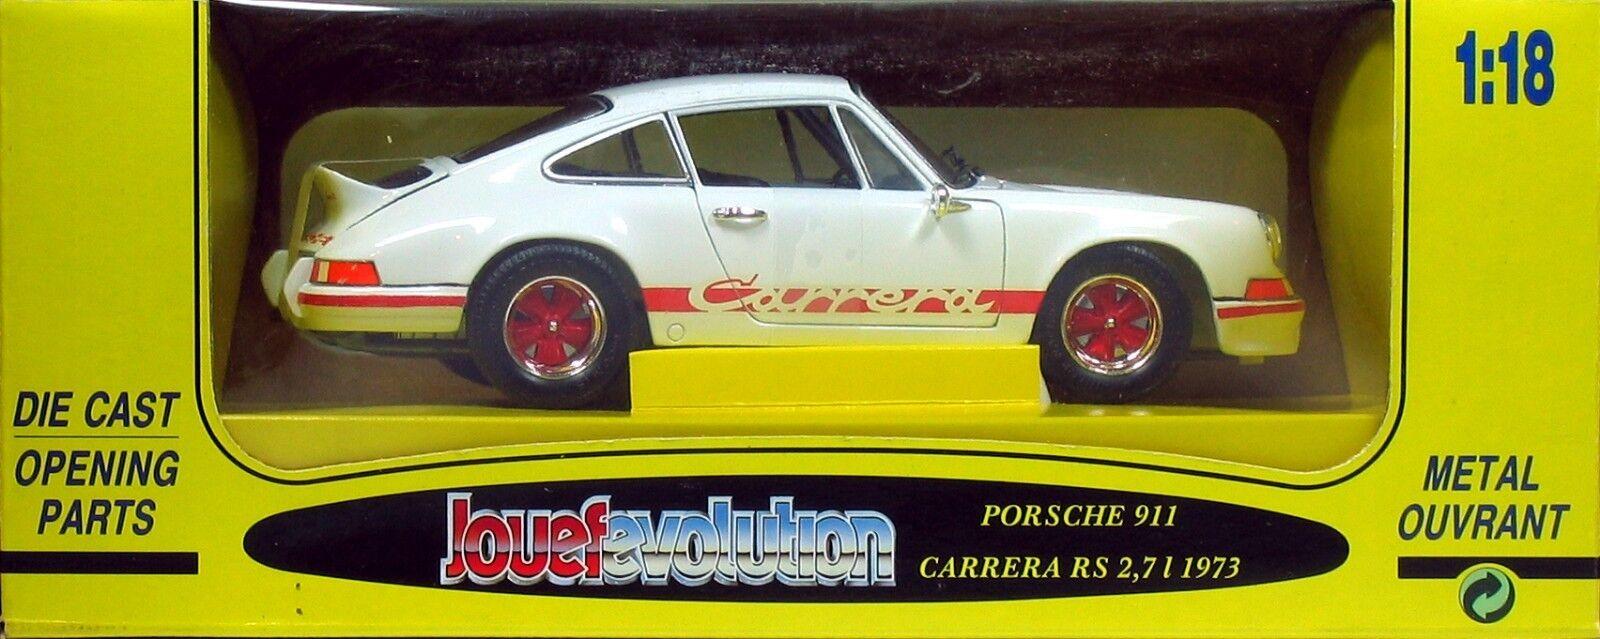 Cadeau spécial à vous spécial PORSCHE 911 CARRERA RS RS CARRERA 823e85